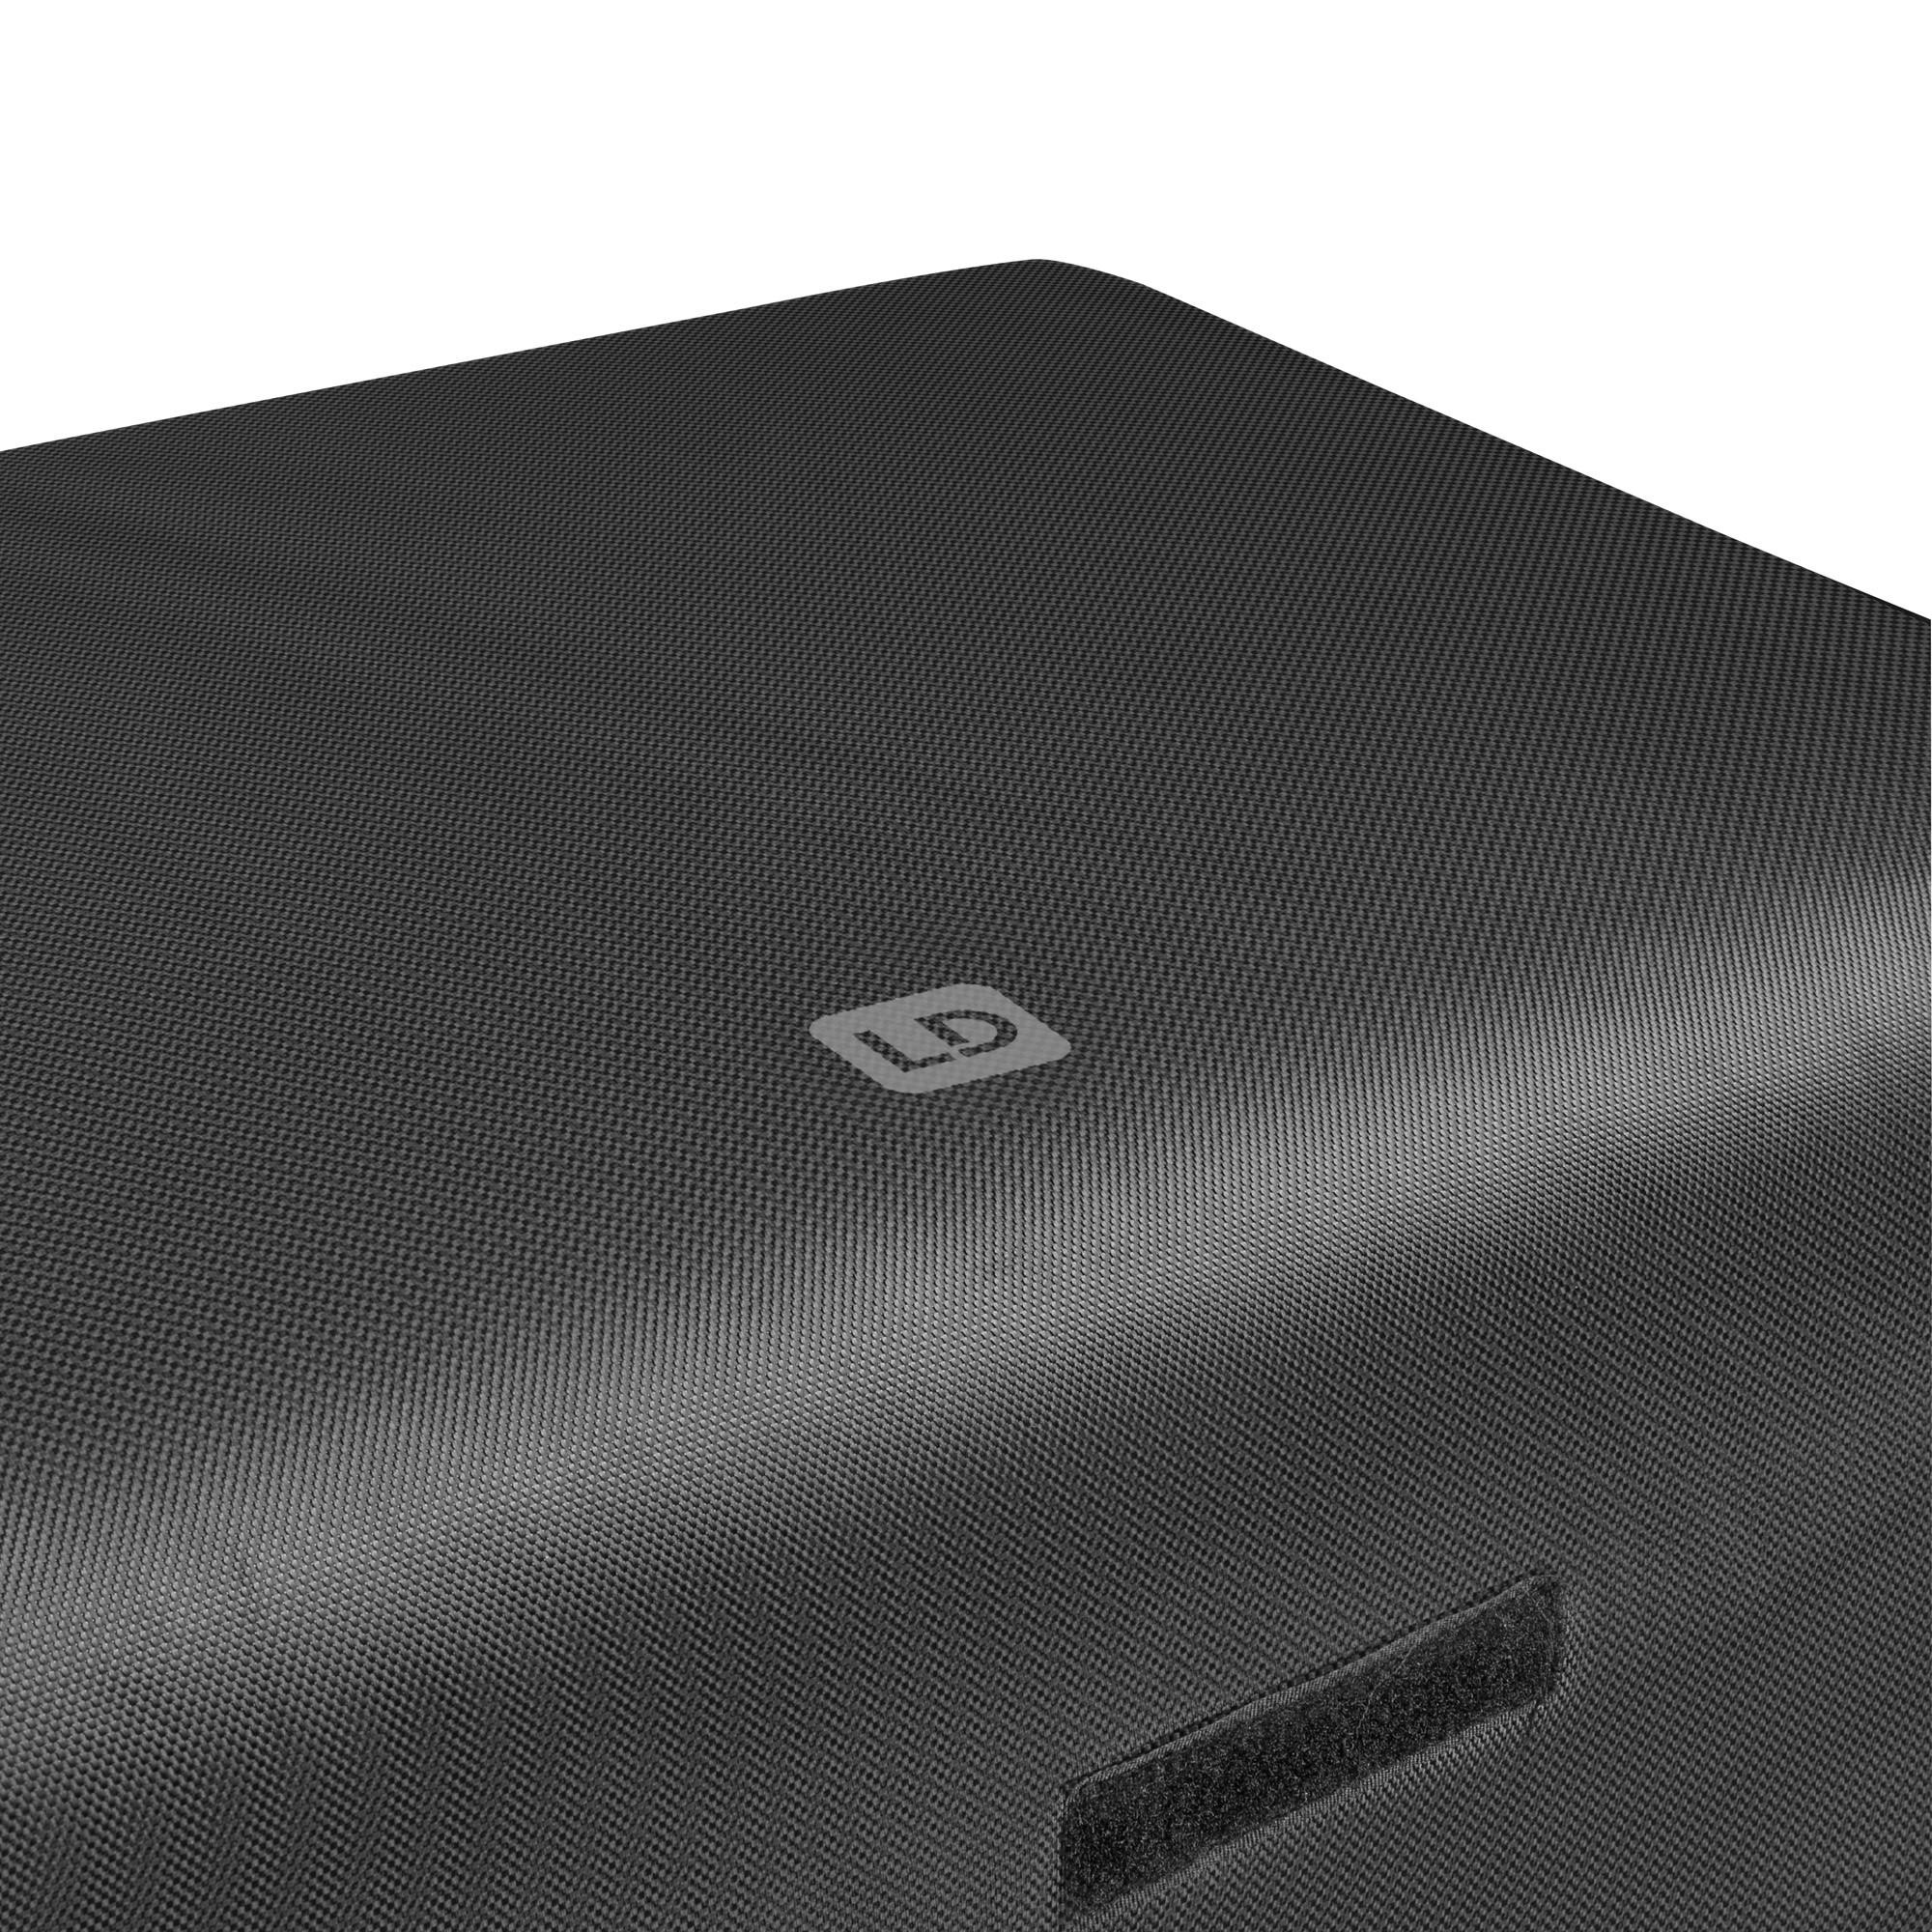 CURV 500 TS SUB PC Gepolsterte Schutzhülle für LD CURV 500® TS Subwoofer